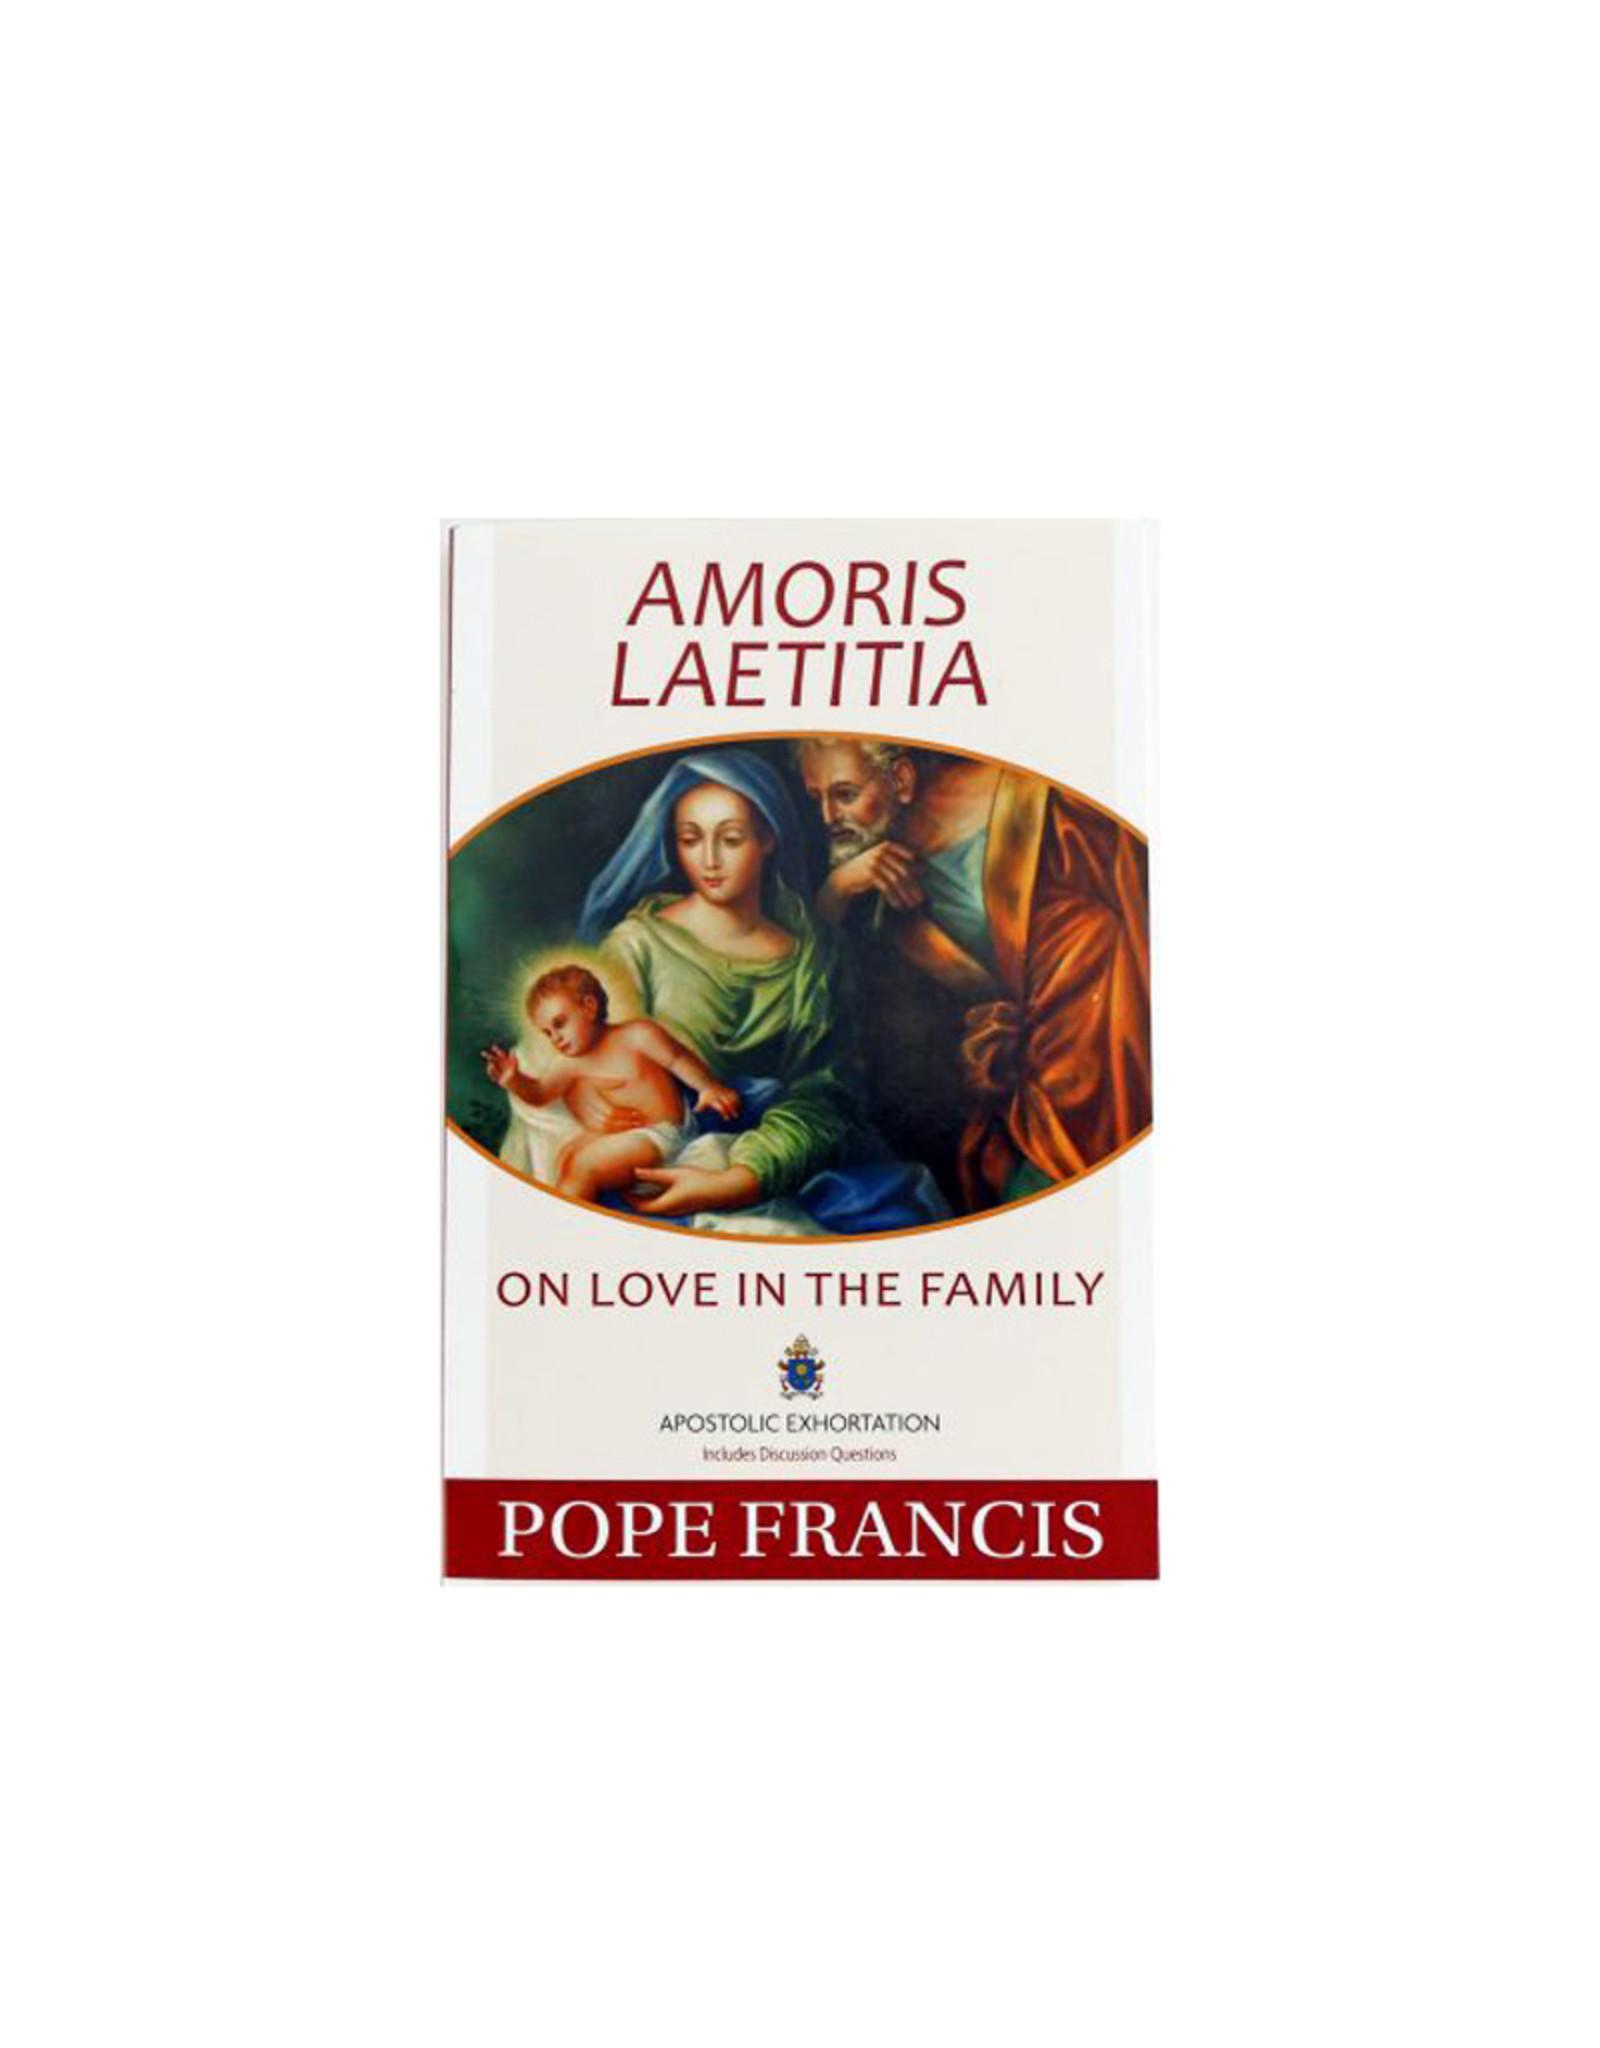 Amoris Laetitia, on love in the family. Apostolic exhortation, Pope Francis